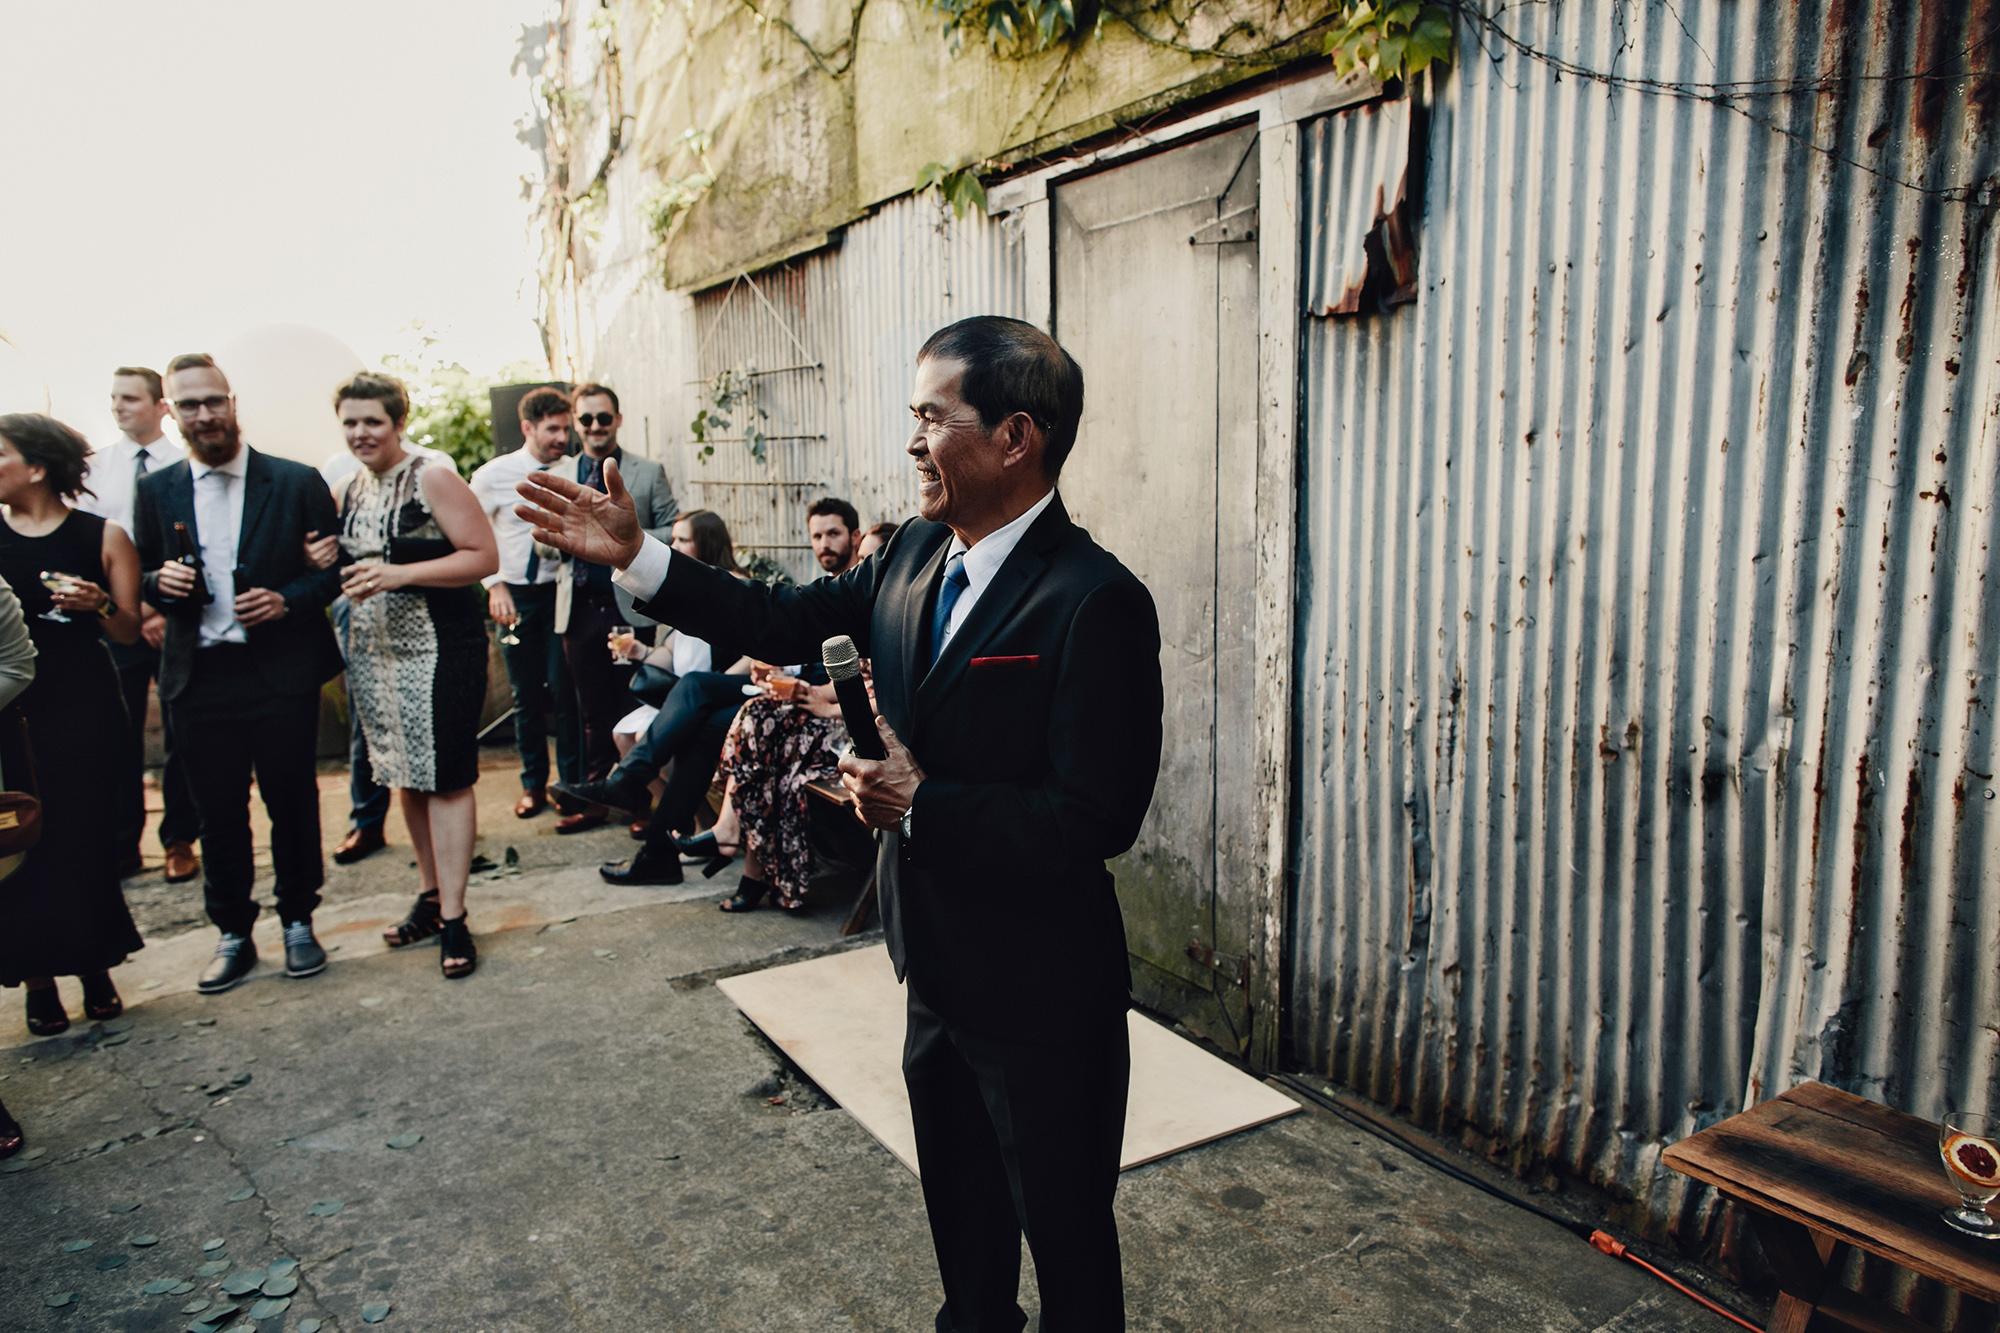 Bonaccord-Vancouver-Wedding-0069.JPG